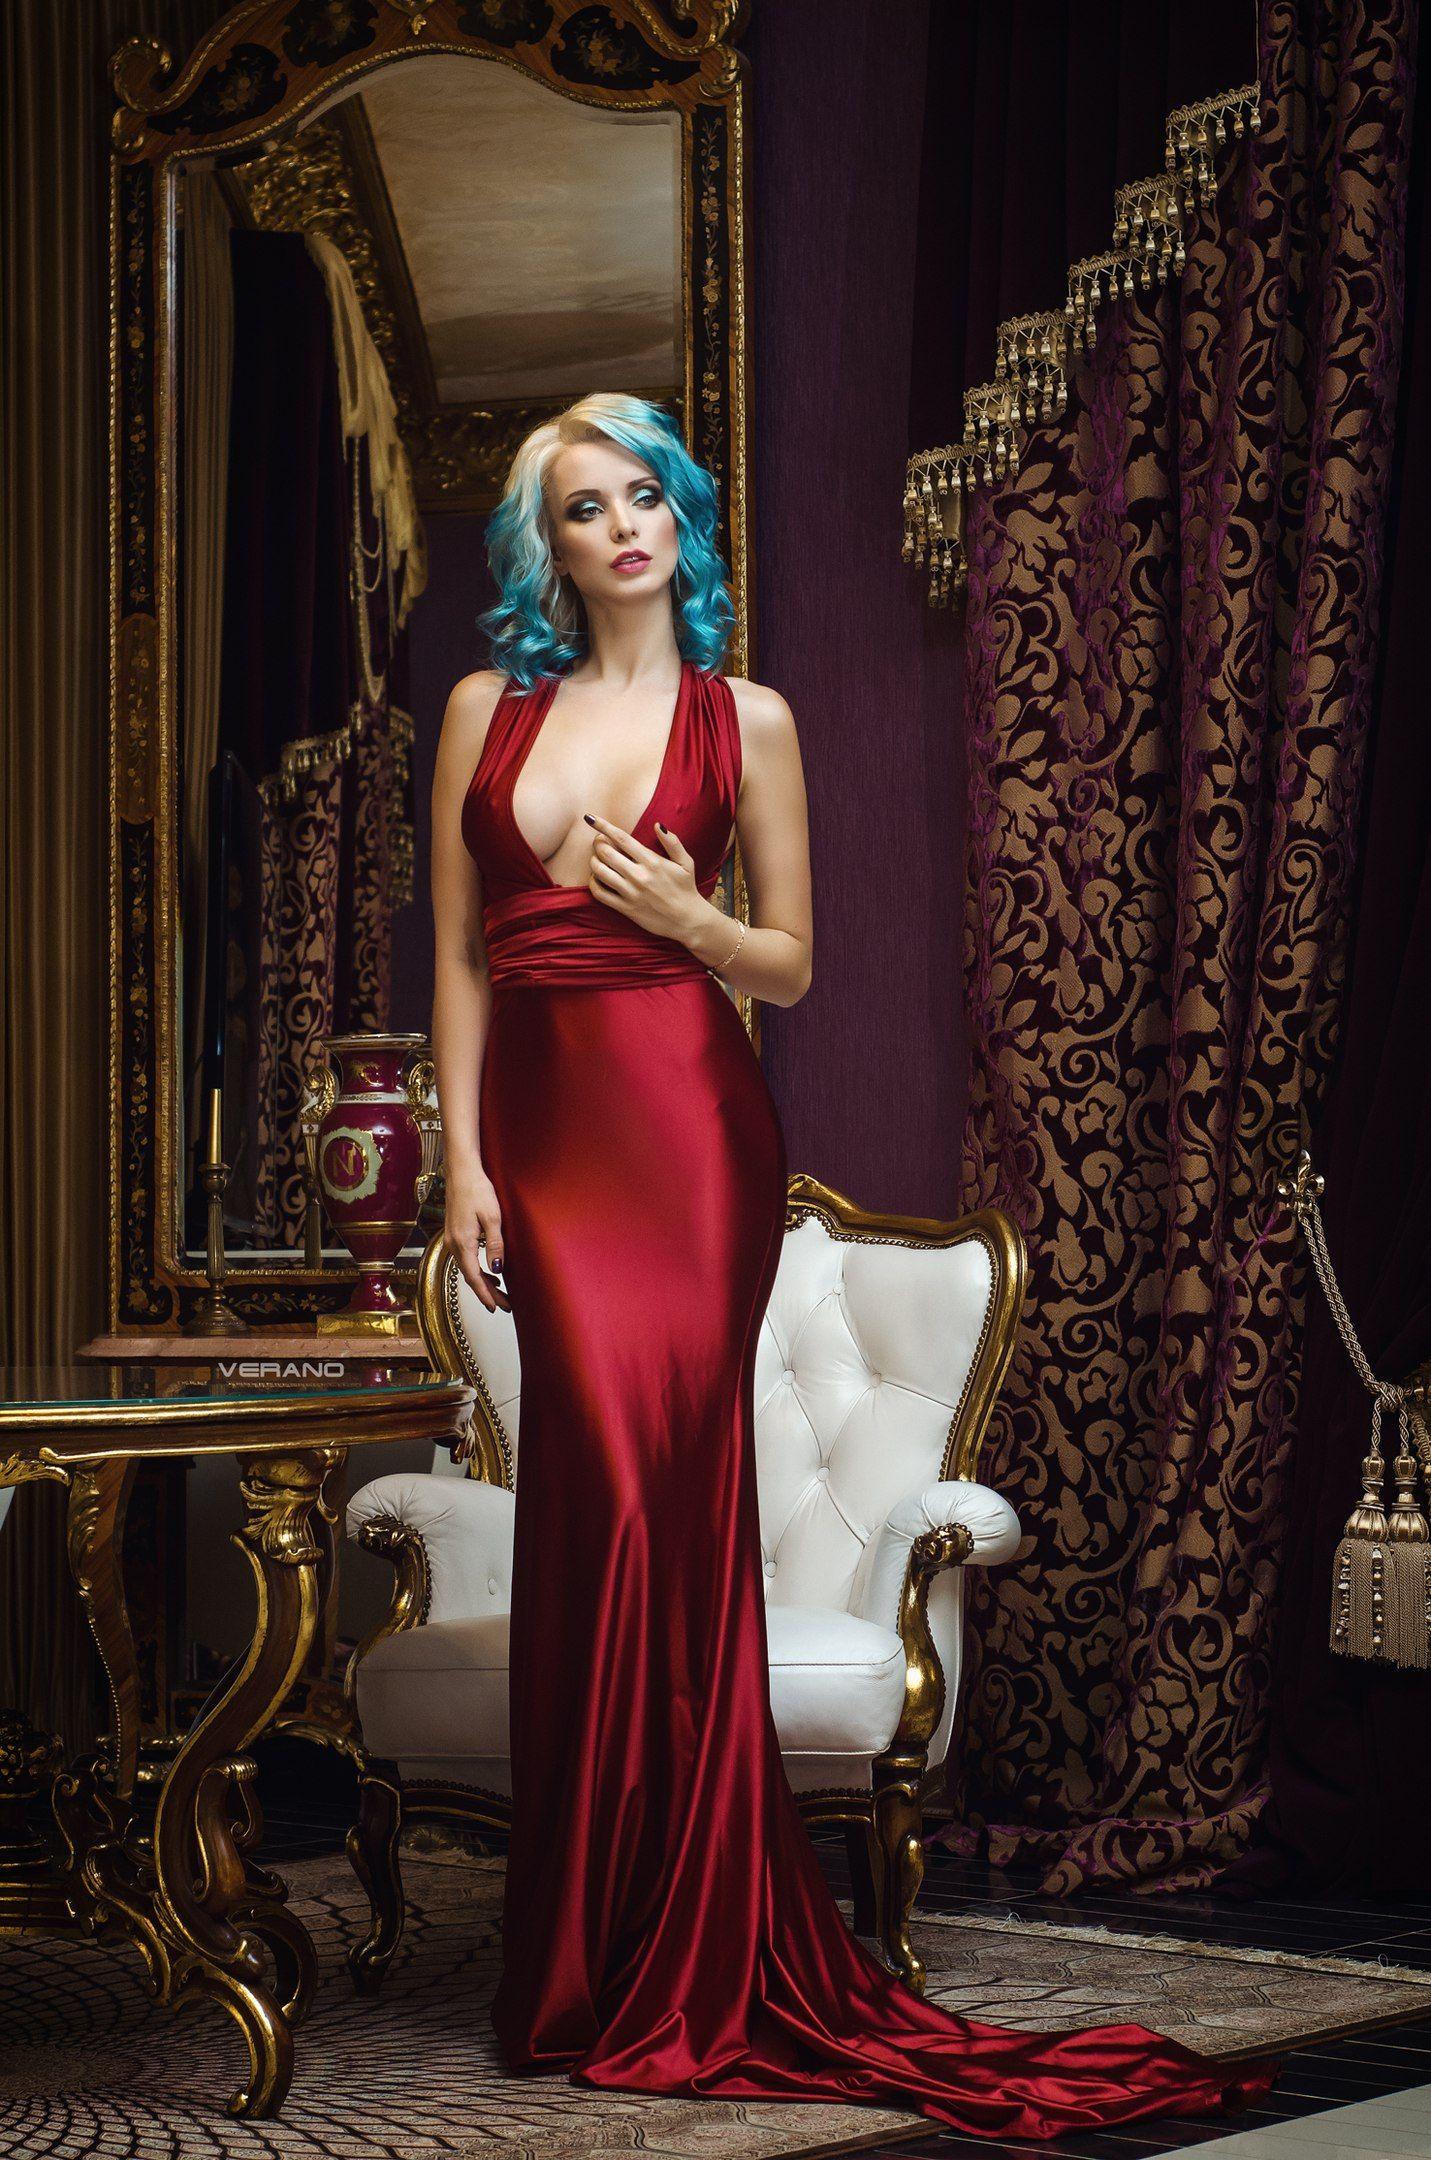 News search results for Ekaterina Enokaeva | Beautiful women ...